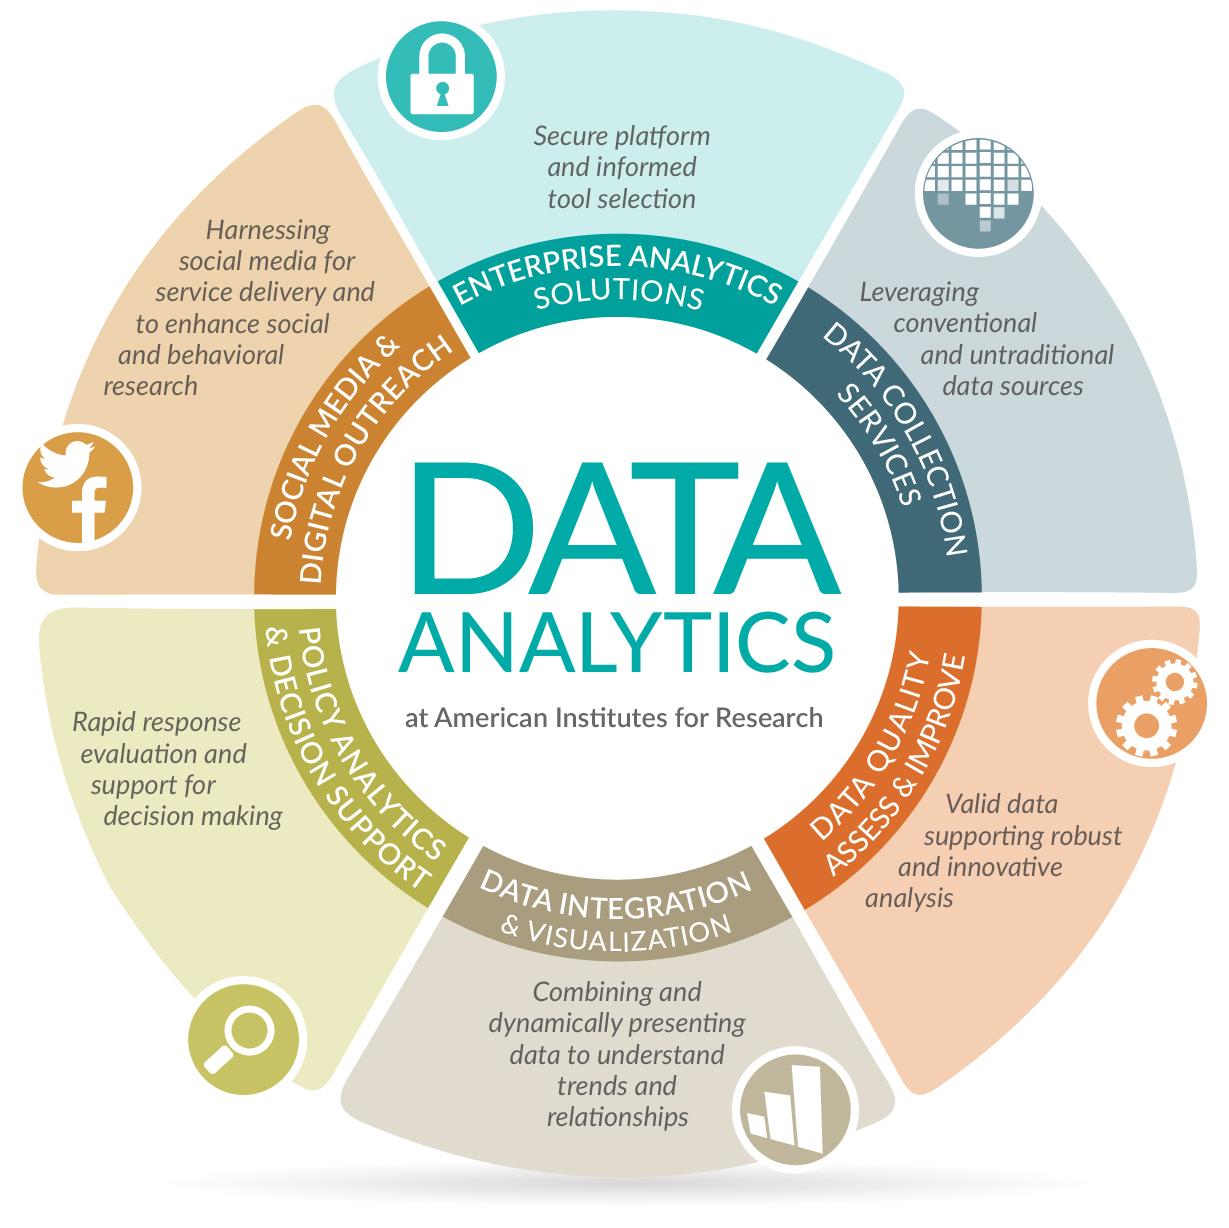 Advanced Data Analysis 4/1